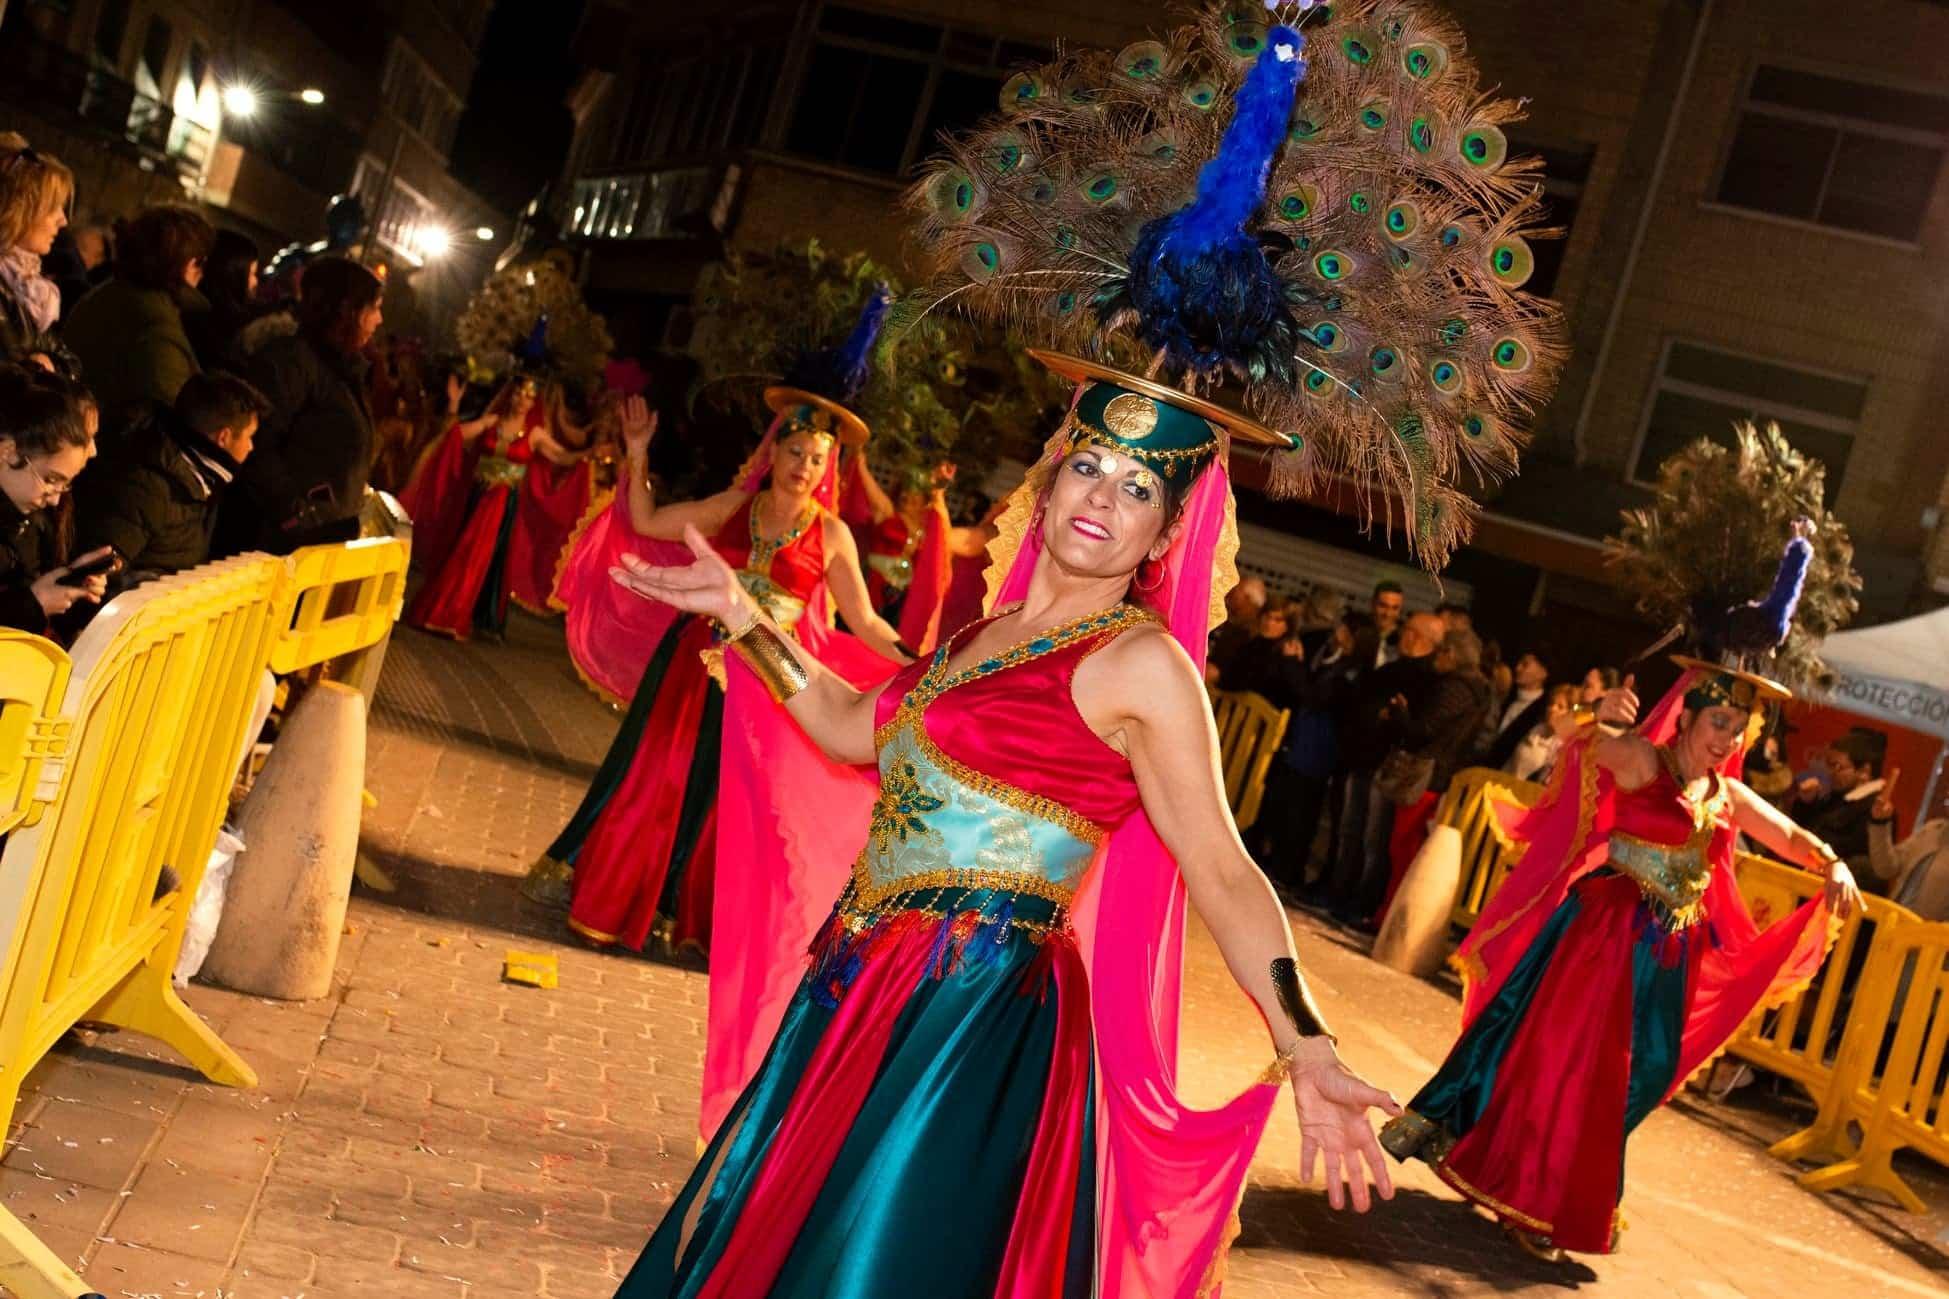 Carnaval de herencia 2020 ofertorio 37 - Selección de fotografías del Ofertorio del Carnaval de Herencia